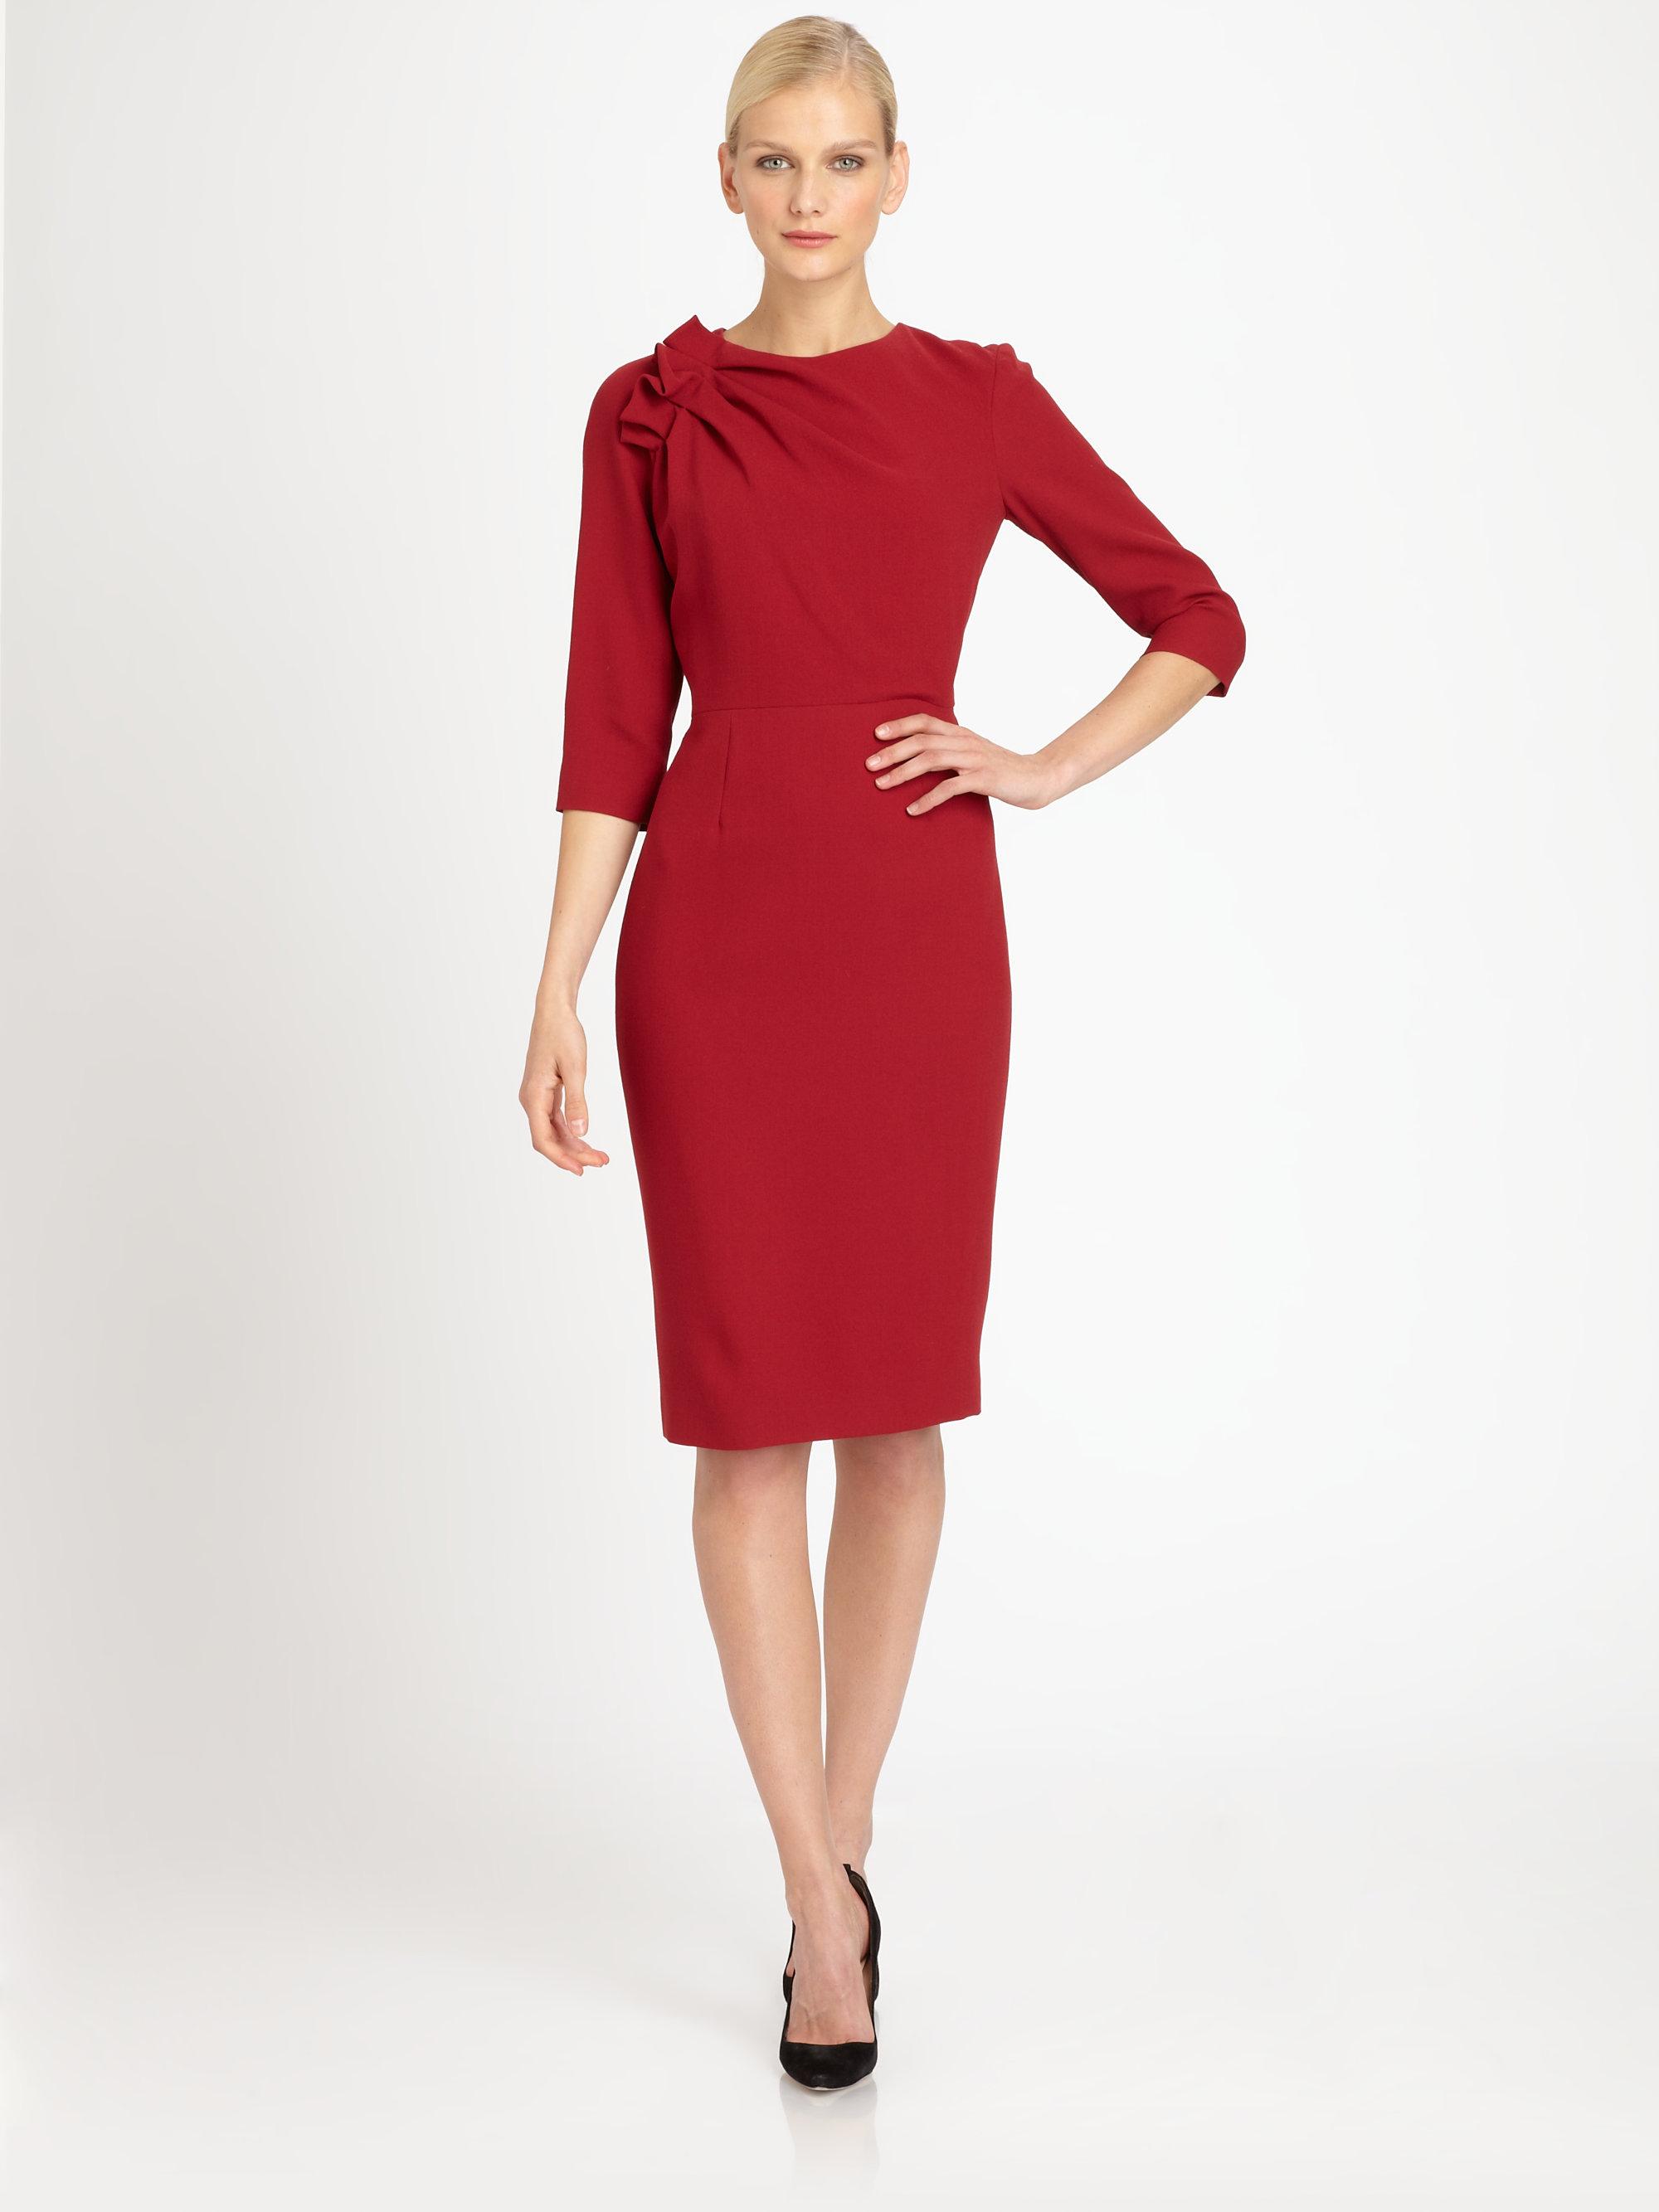 Lyst Carolina Herrera Crepe Dress In Red